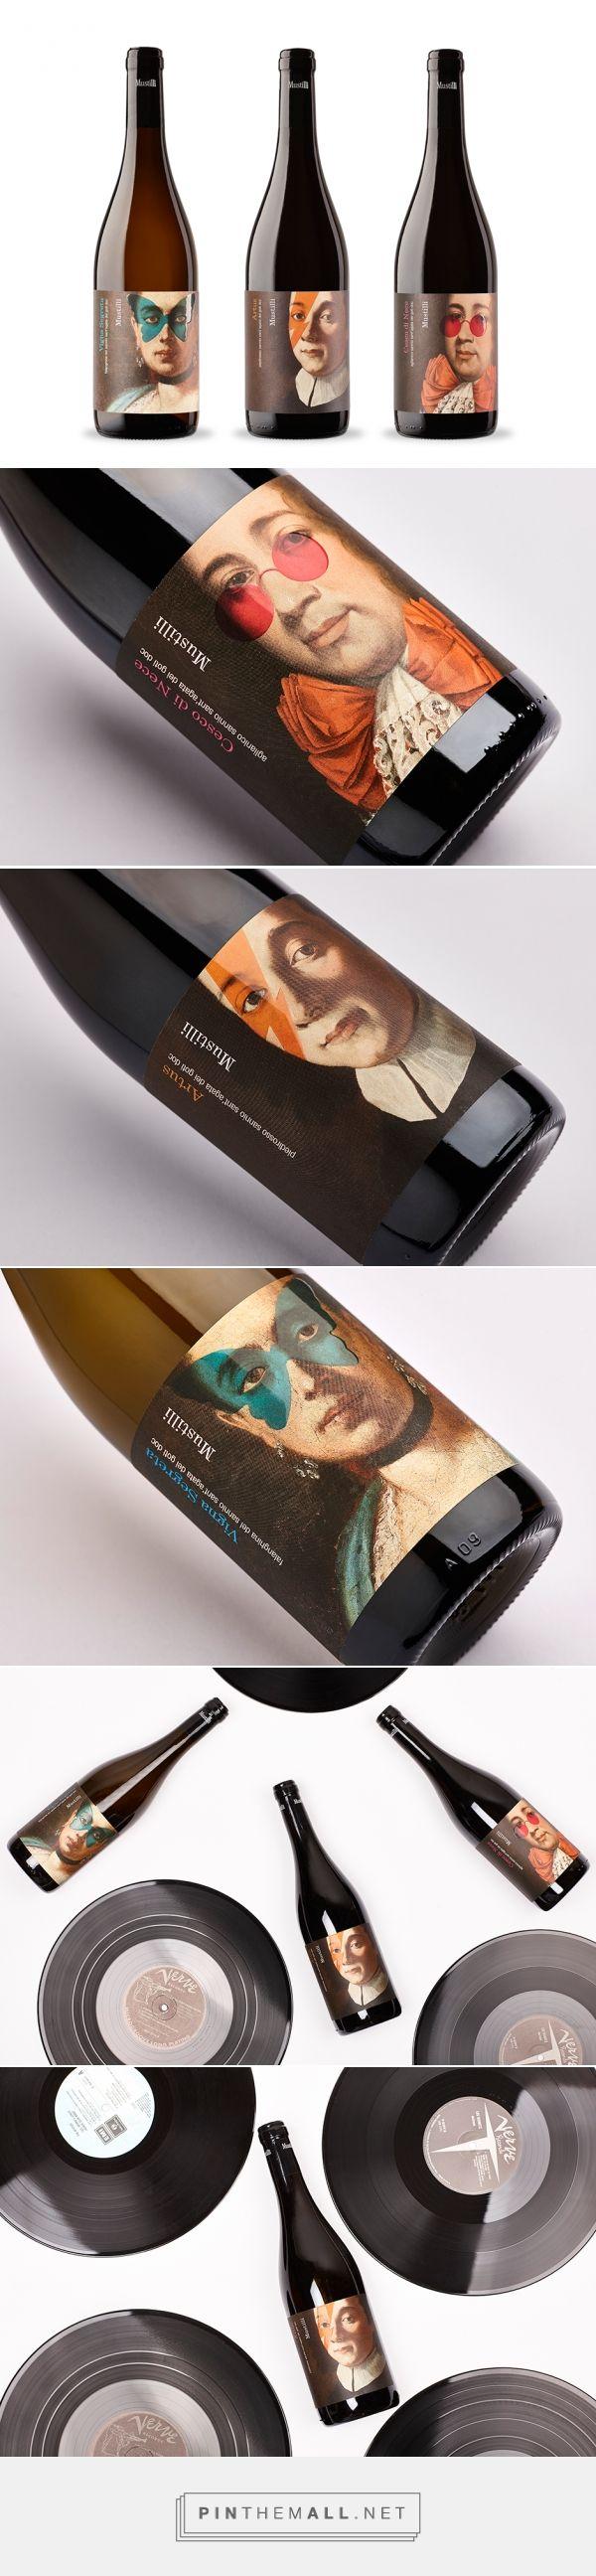 Mustilli - the Ancestors wine label design by nju:comunicazione - http://www.packagingoftheworld.com/2016/11/mustilli-ancestors.html